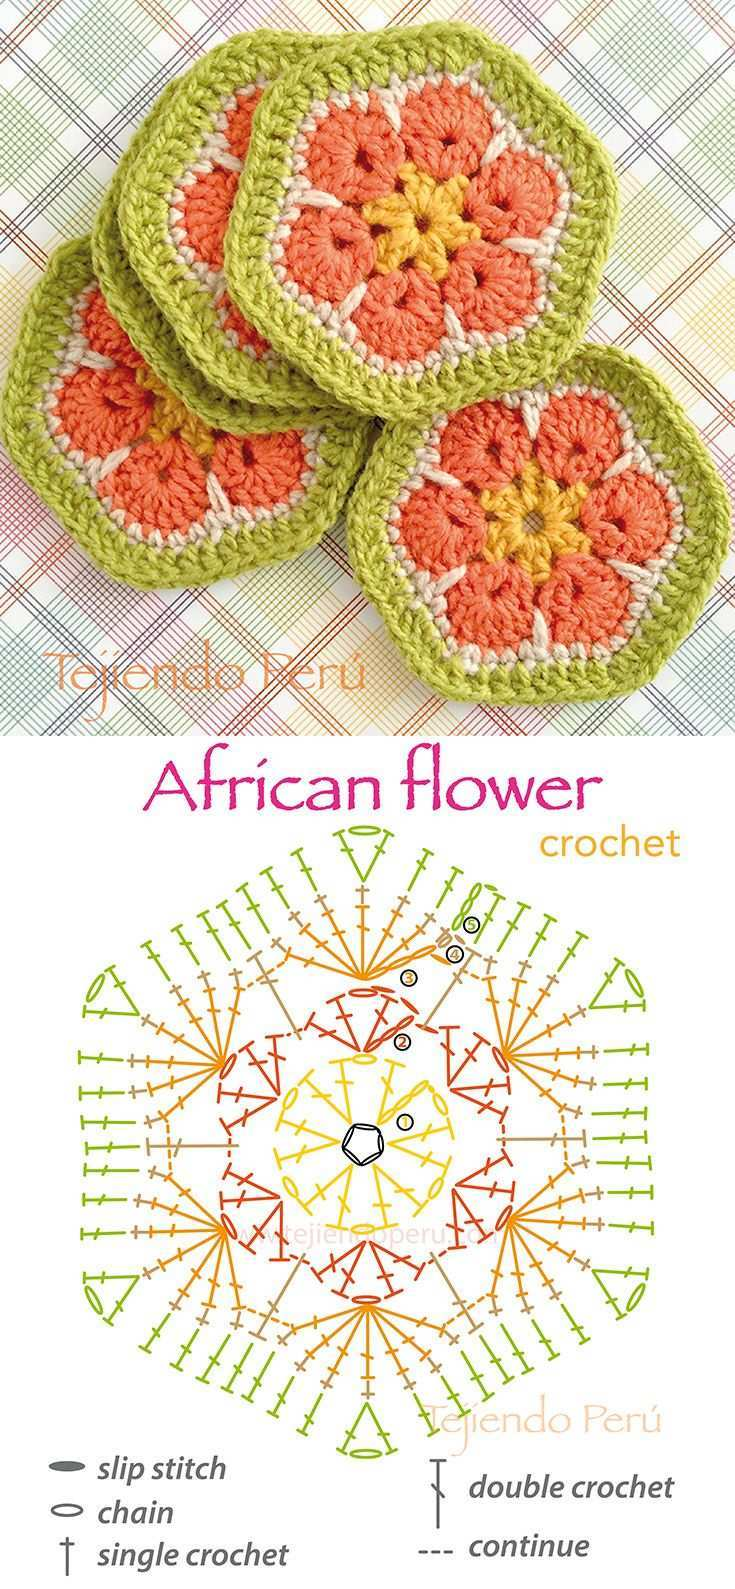 Crochet African Flower Pattern Helpful When Making The Stuffed Elephant Would Like To Make Pillow Cove Hakeln Muster Hakeln Afrikanische Blumen Hakeln Ideen